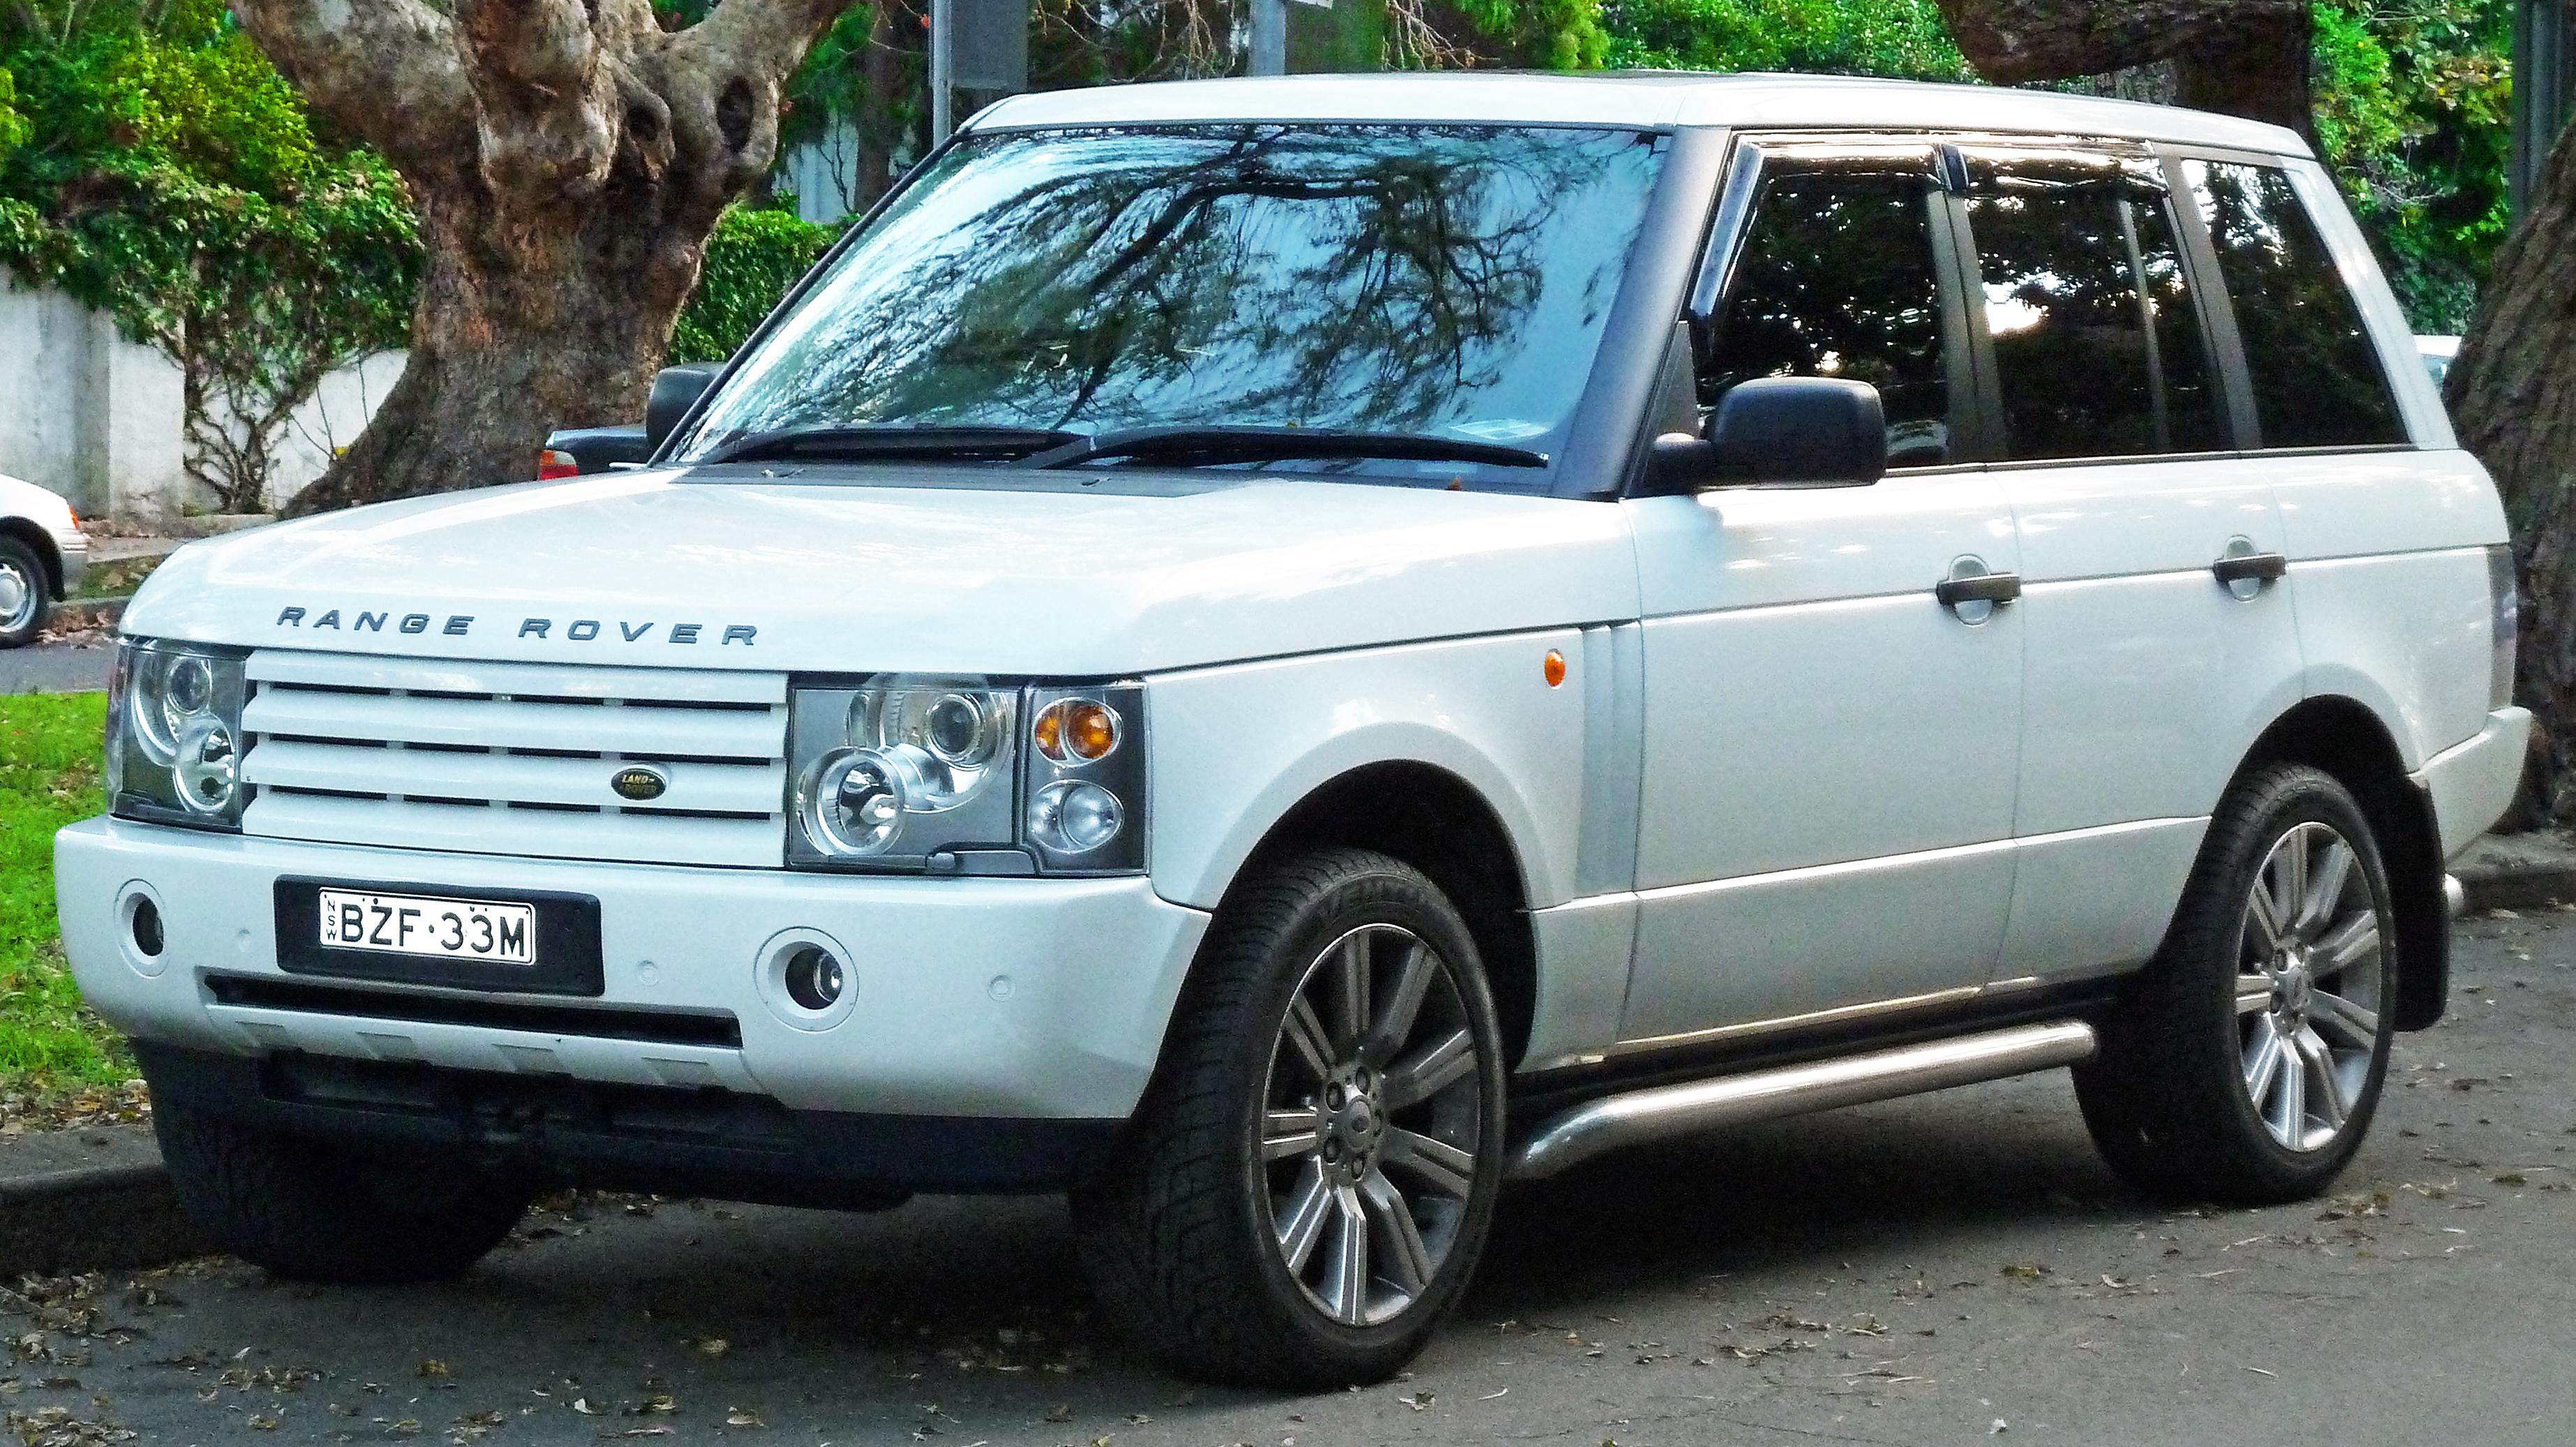 https://upload.wikimedia.org/wikipedia/commons/8/81/2003_Land_Rover_Range_Rover_%28L322_03MY%29_Vogue_wagon_%282012-06-04%29_01.jpg